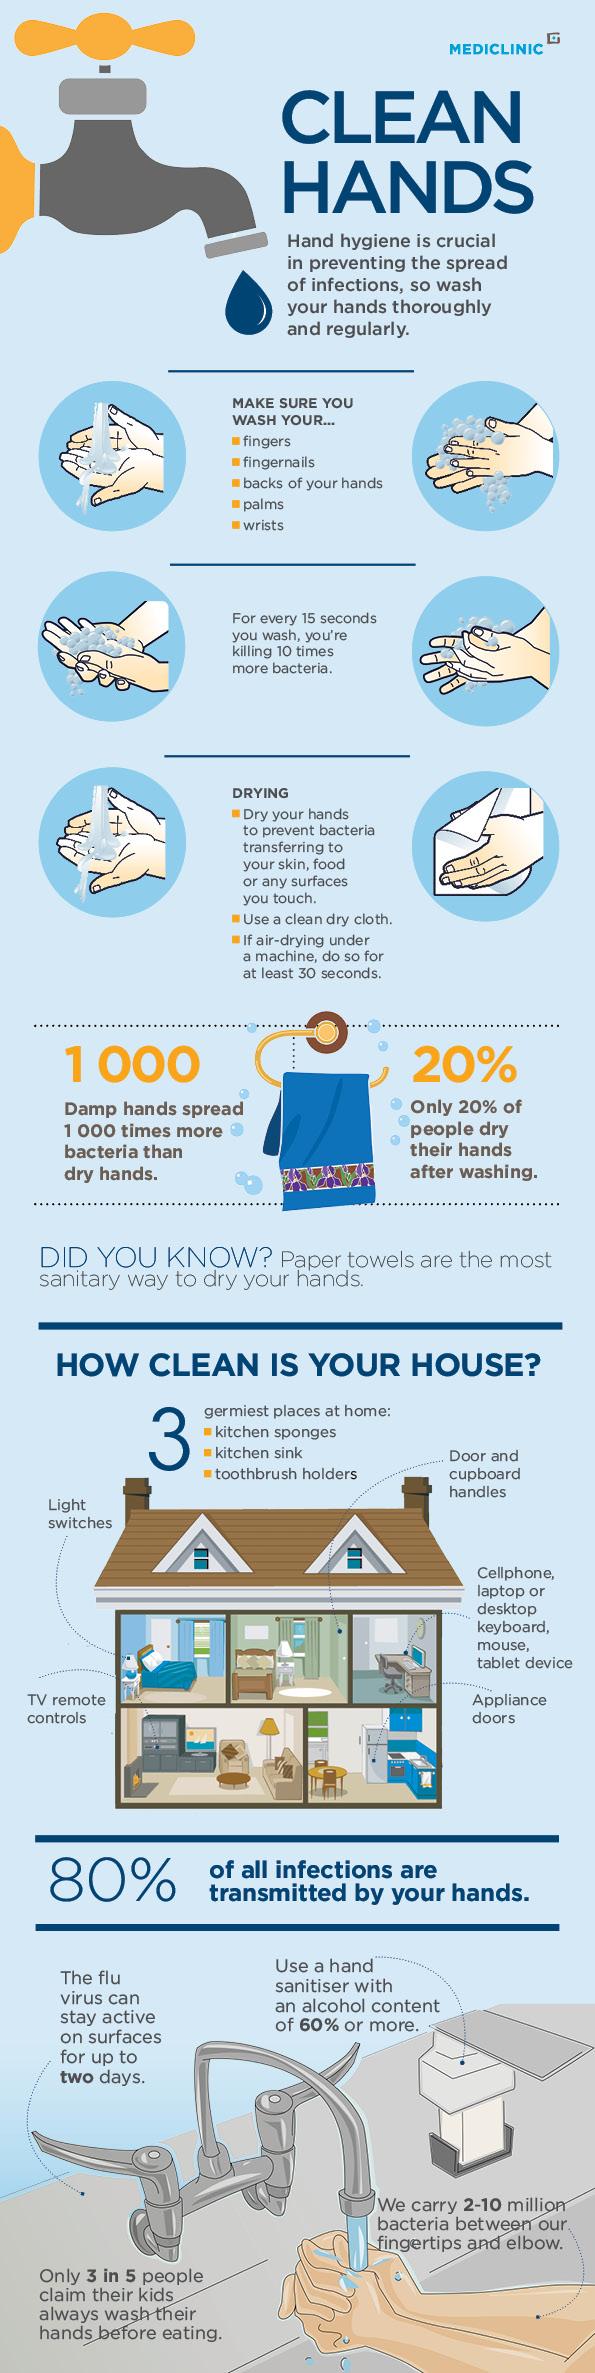 hand hygiene_infographic